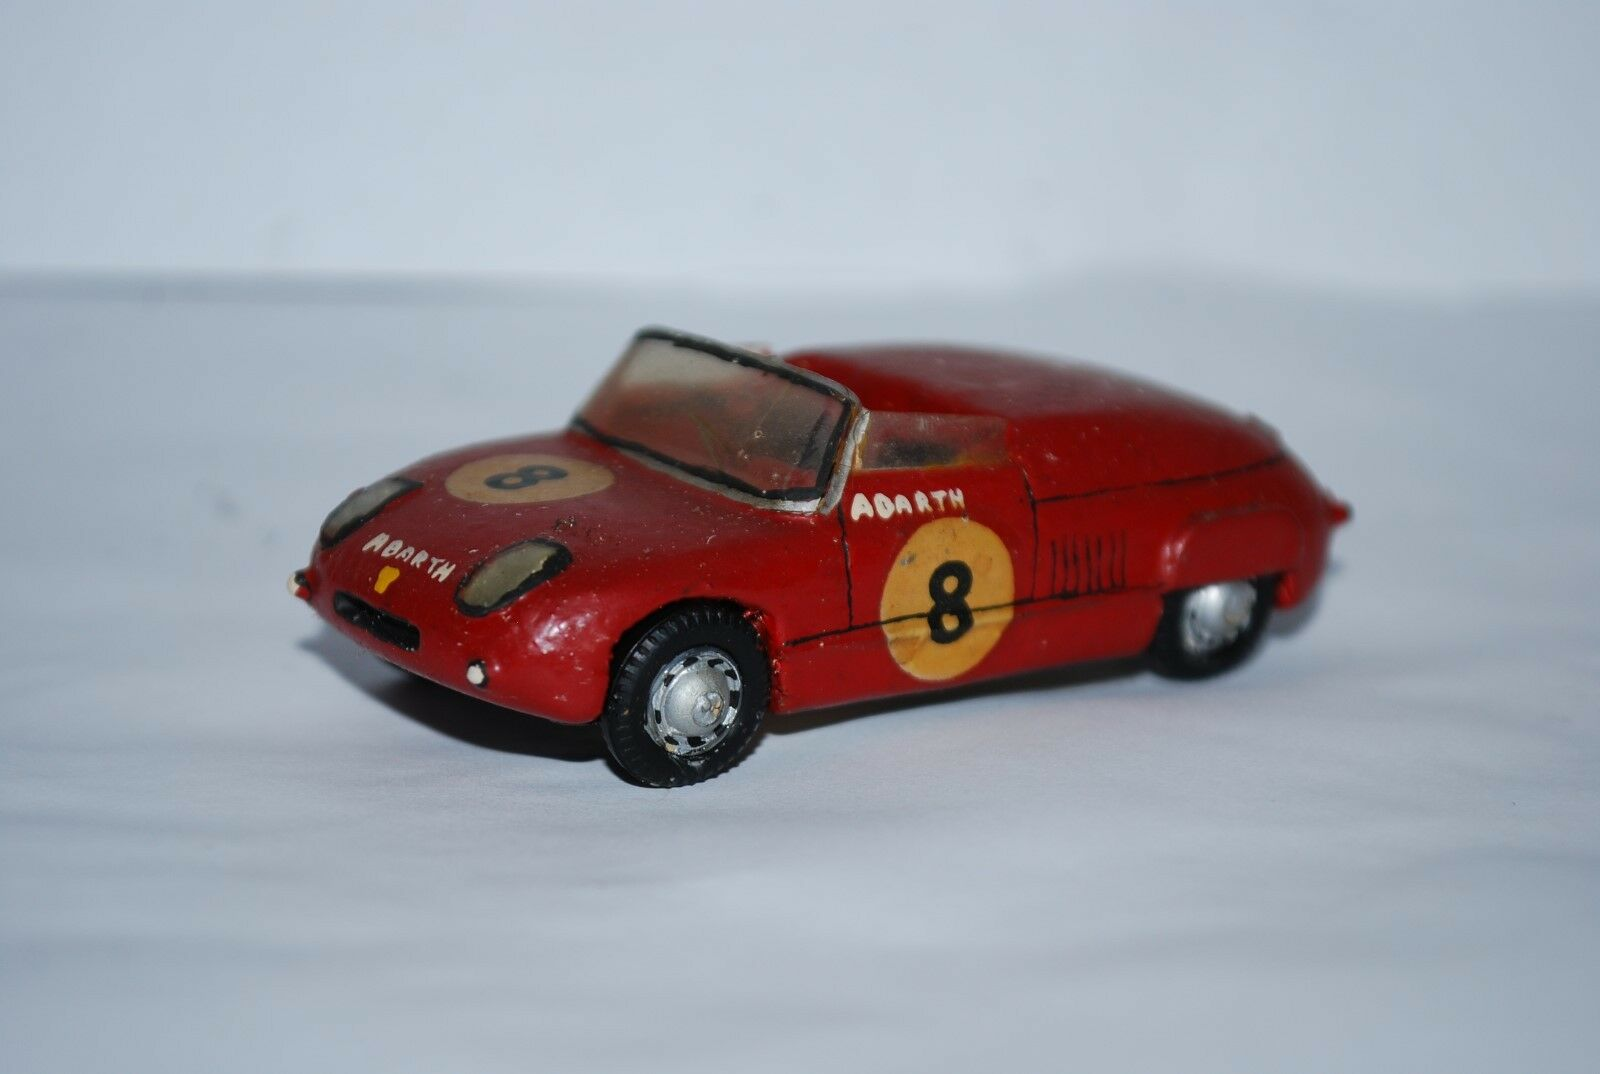 RD MARMANDE FIAT ABARTH 850 SPORT LE MANS 1961 SCALE 1 43 TRES RARE